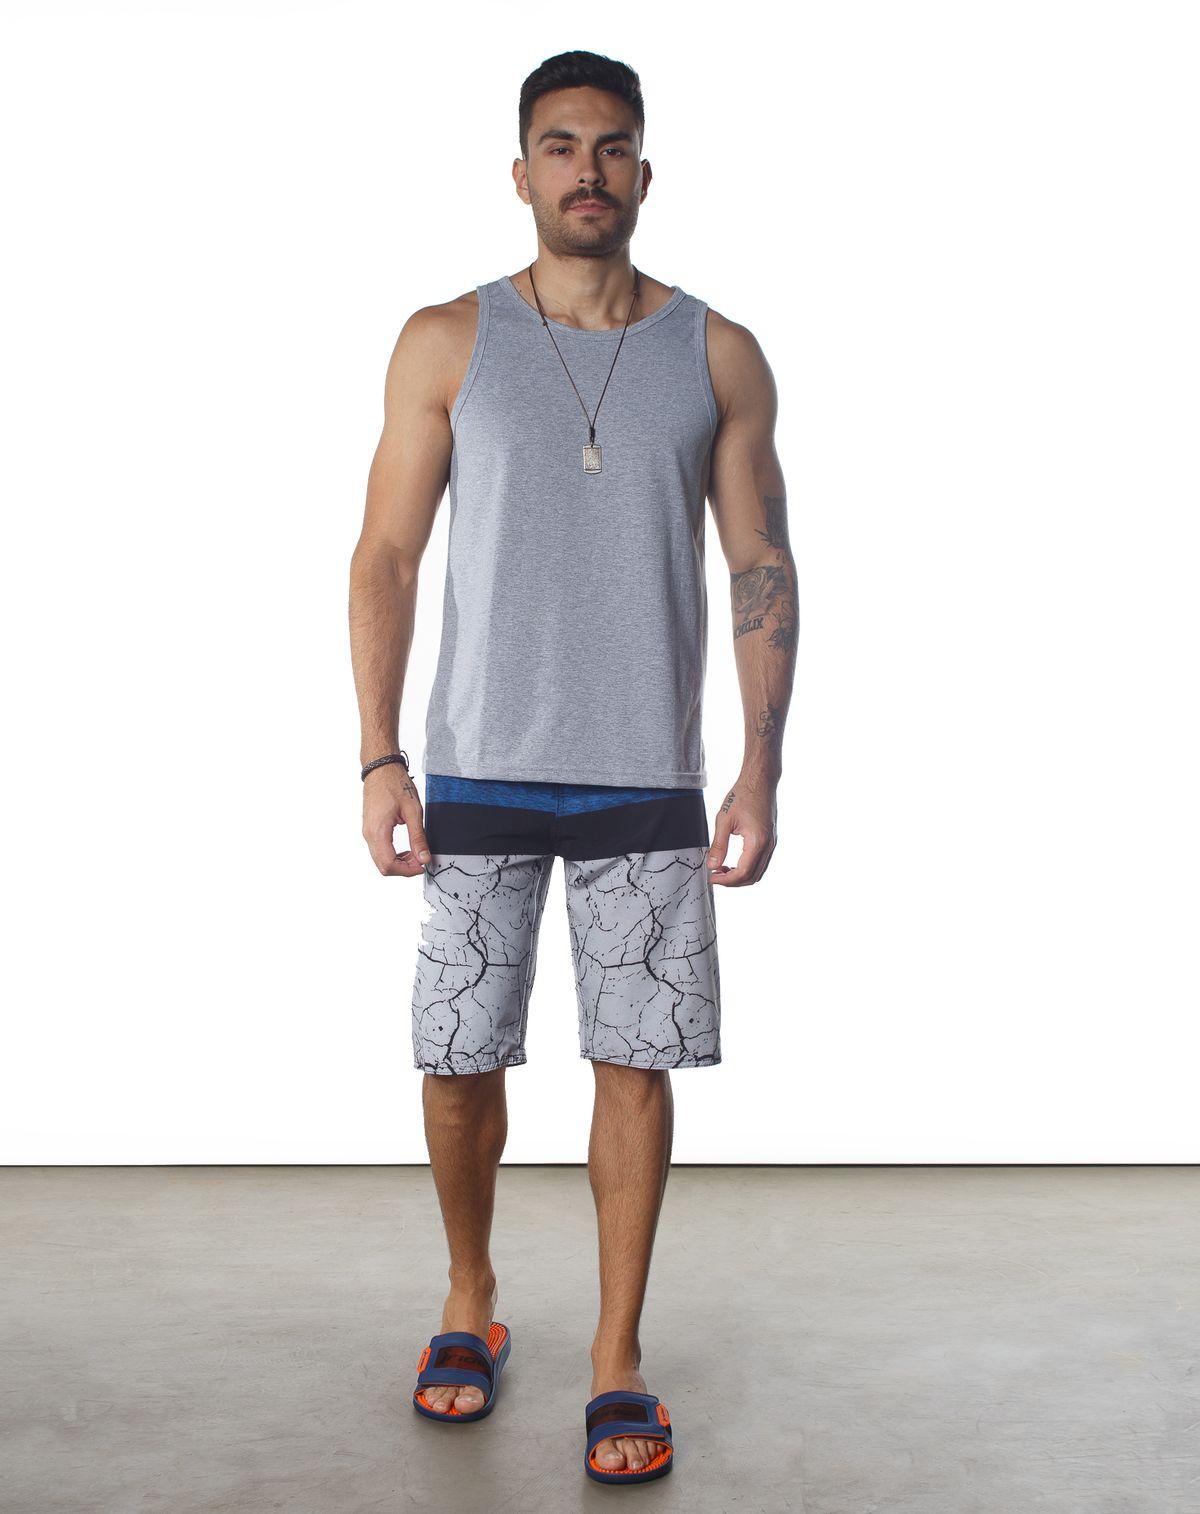 560352001-bermuda-masculina-surf-estampada-royal-branco-36-f7e